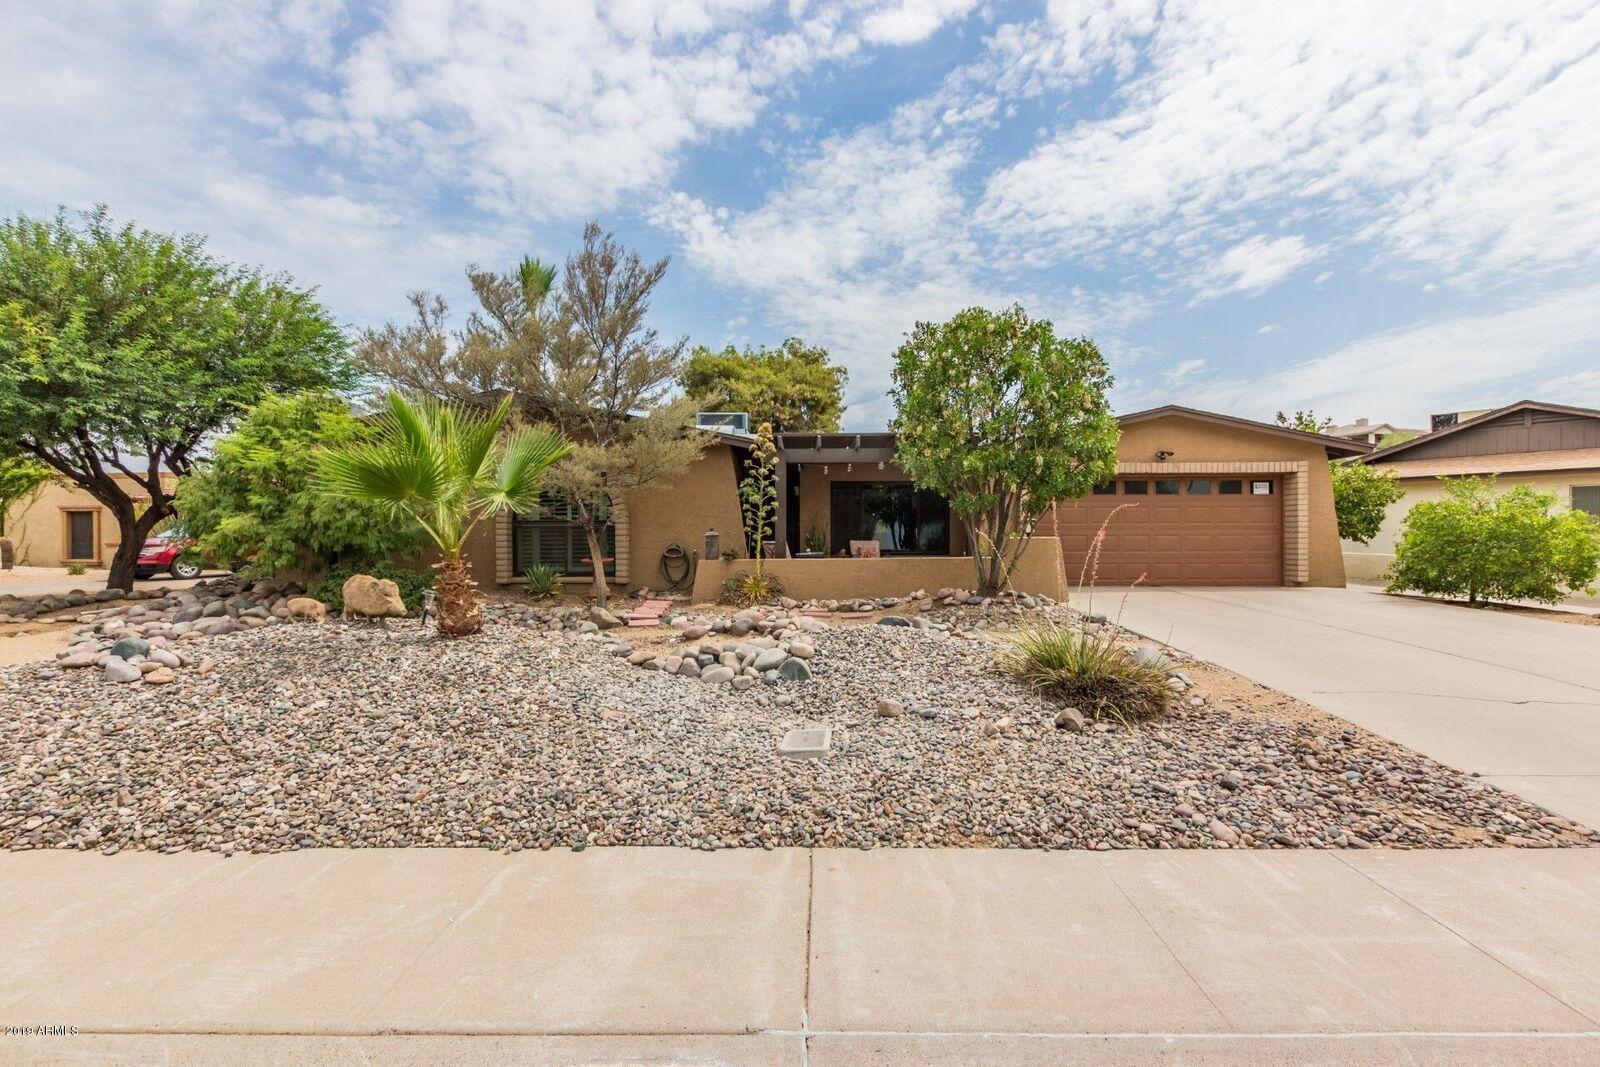 Photo of 1744 W Acoma Drive, Phoenix, AZ 85023